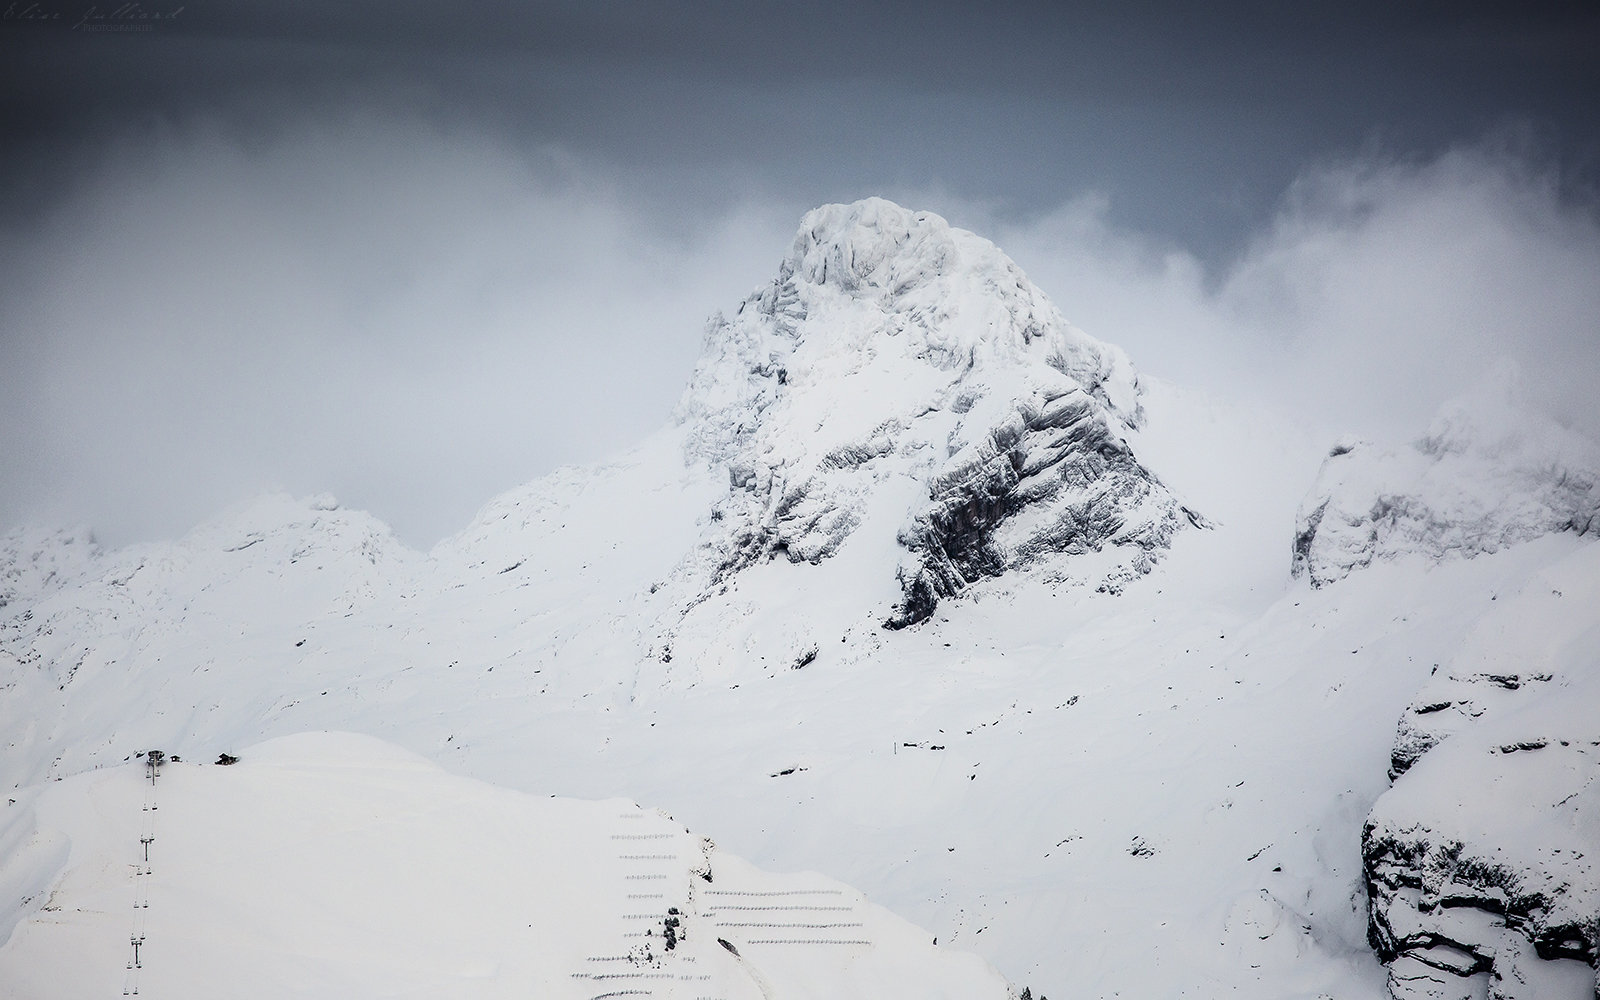 elise-julliard-photographe-photo-paysage-montagne-annecy-aravis